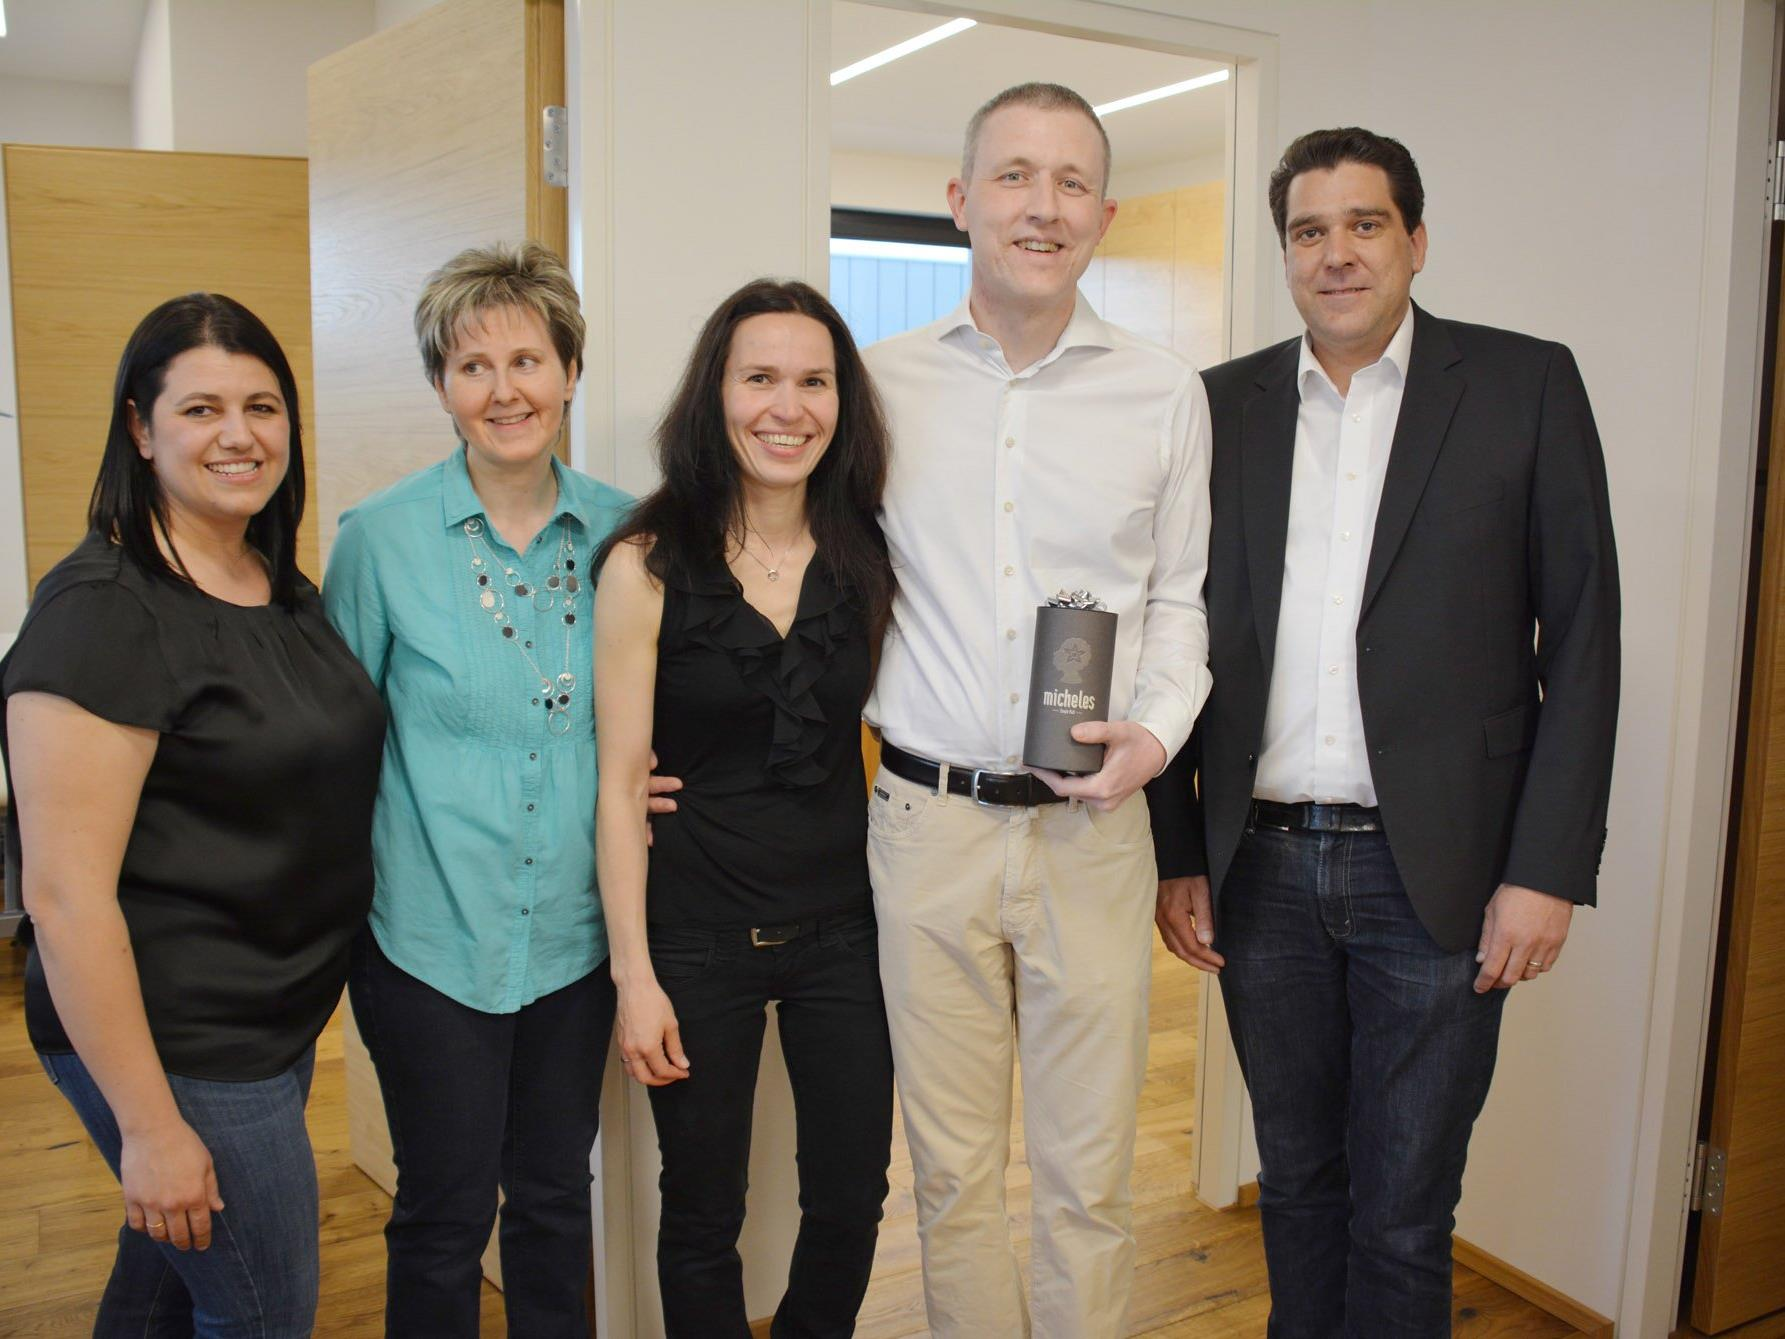 Das Team: Sajma Coralic, Marion Weber mit Christine und Andreas Astheimer; Bgm Harald Köhlmeier.